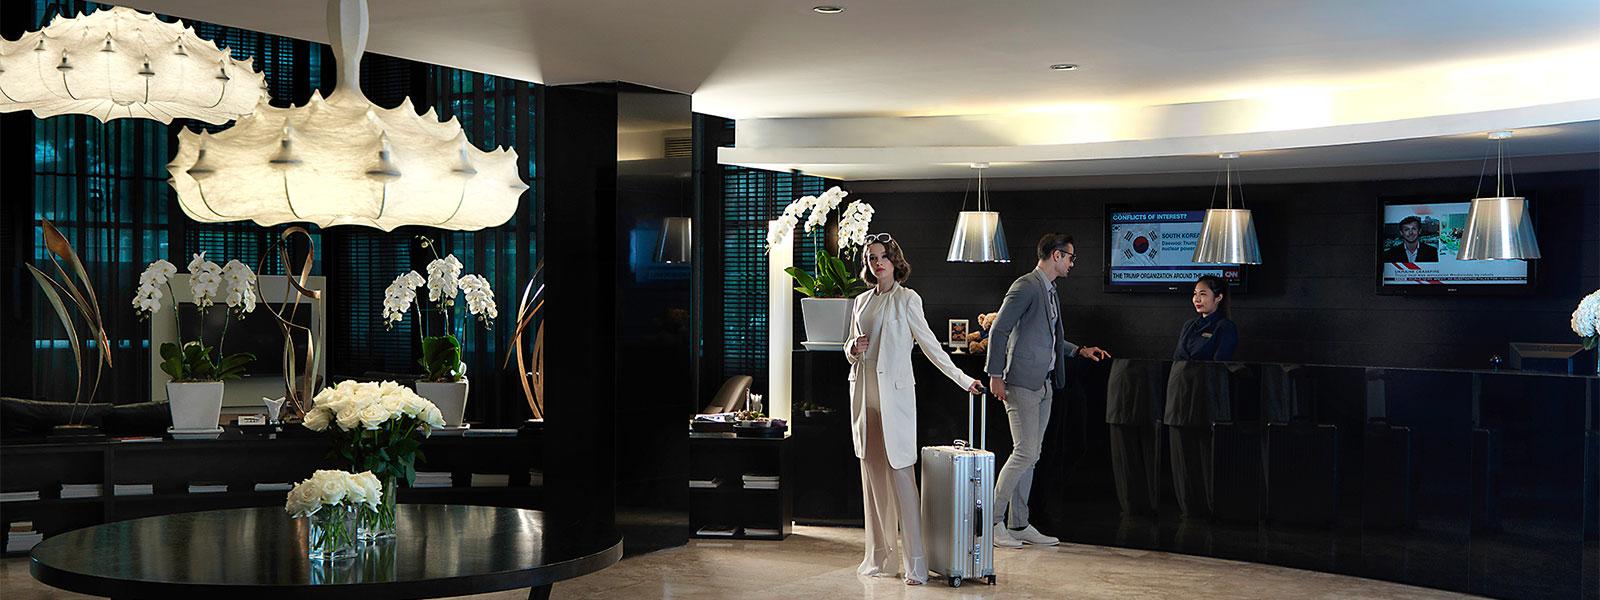 Lobby_3 - S15 Sukhumvit Hotel